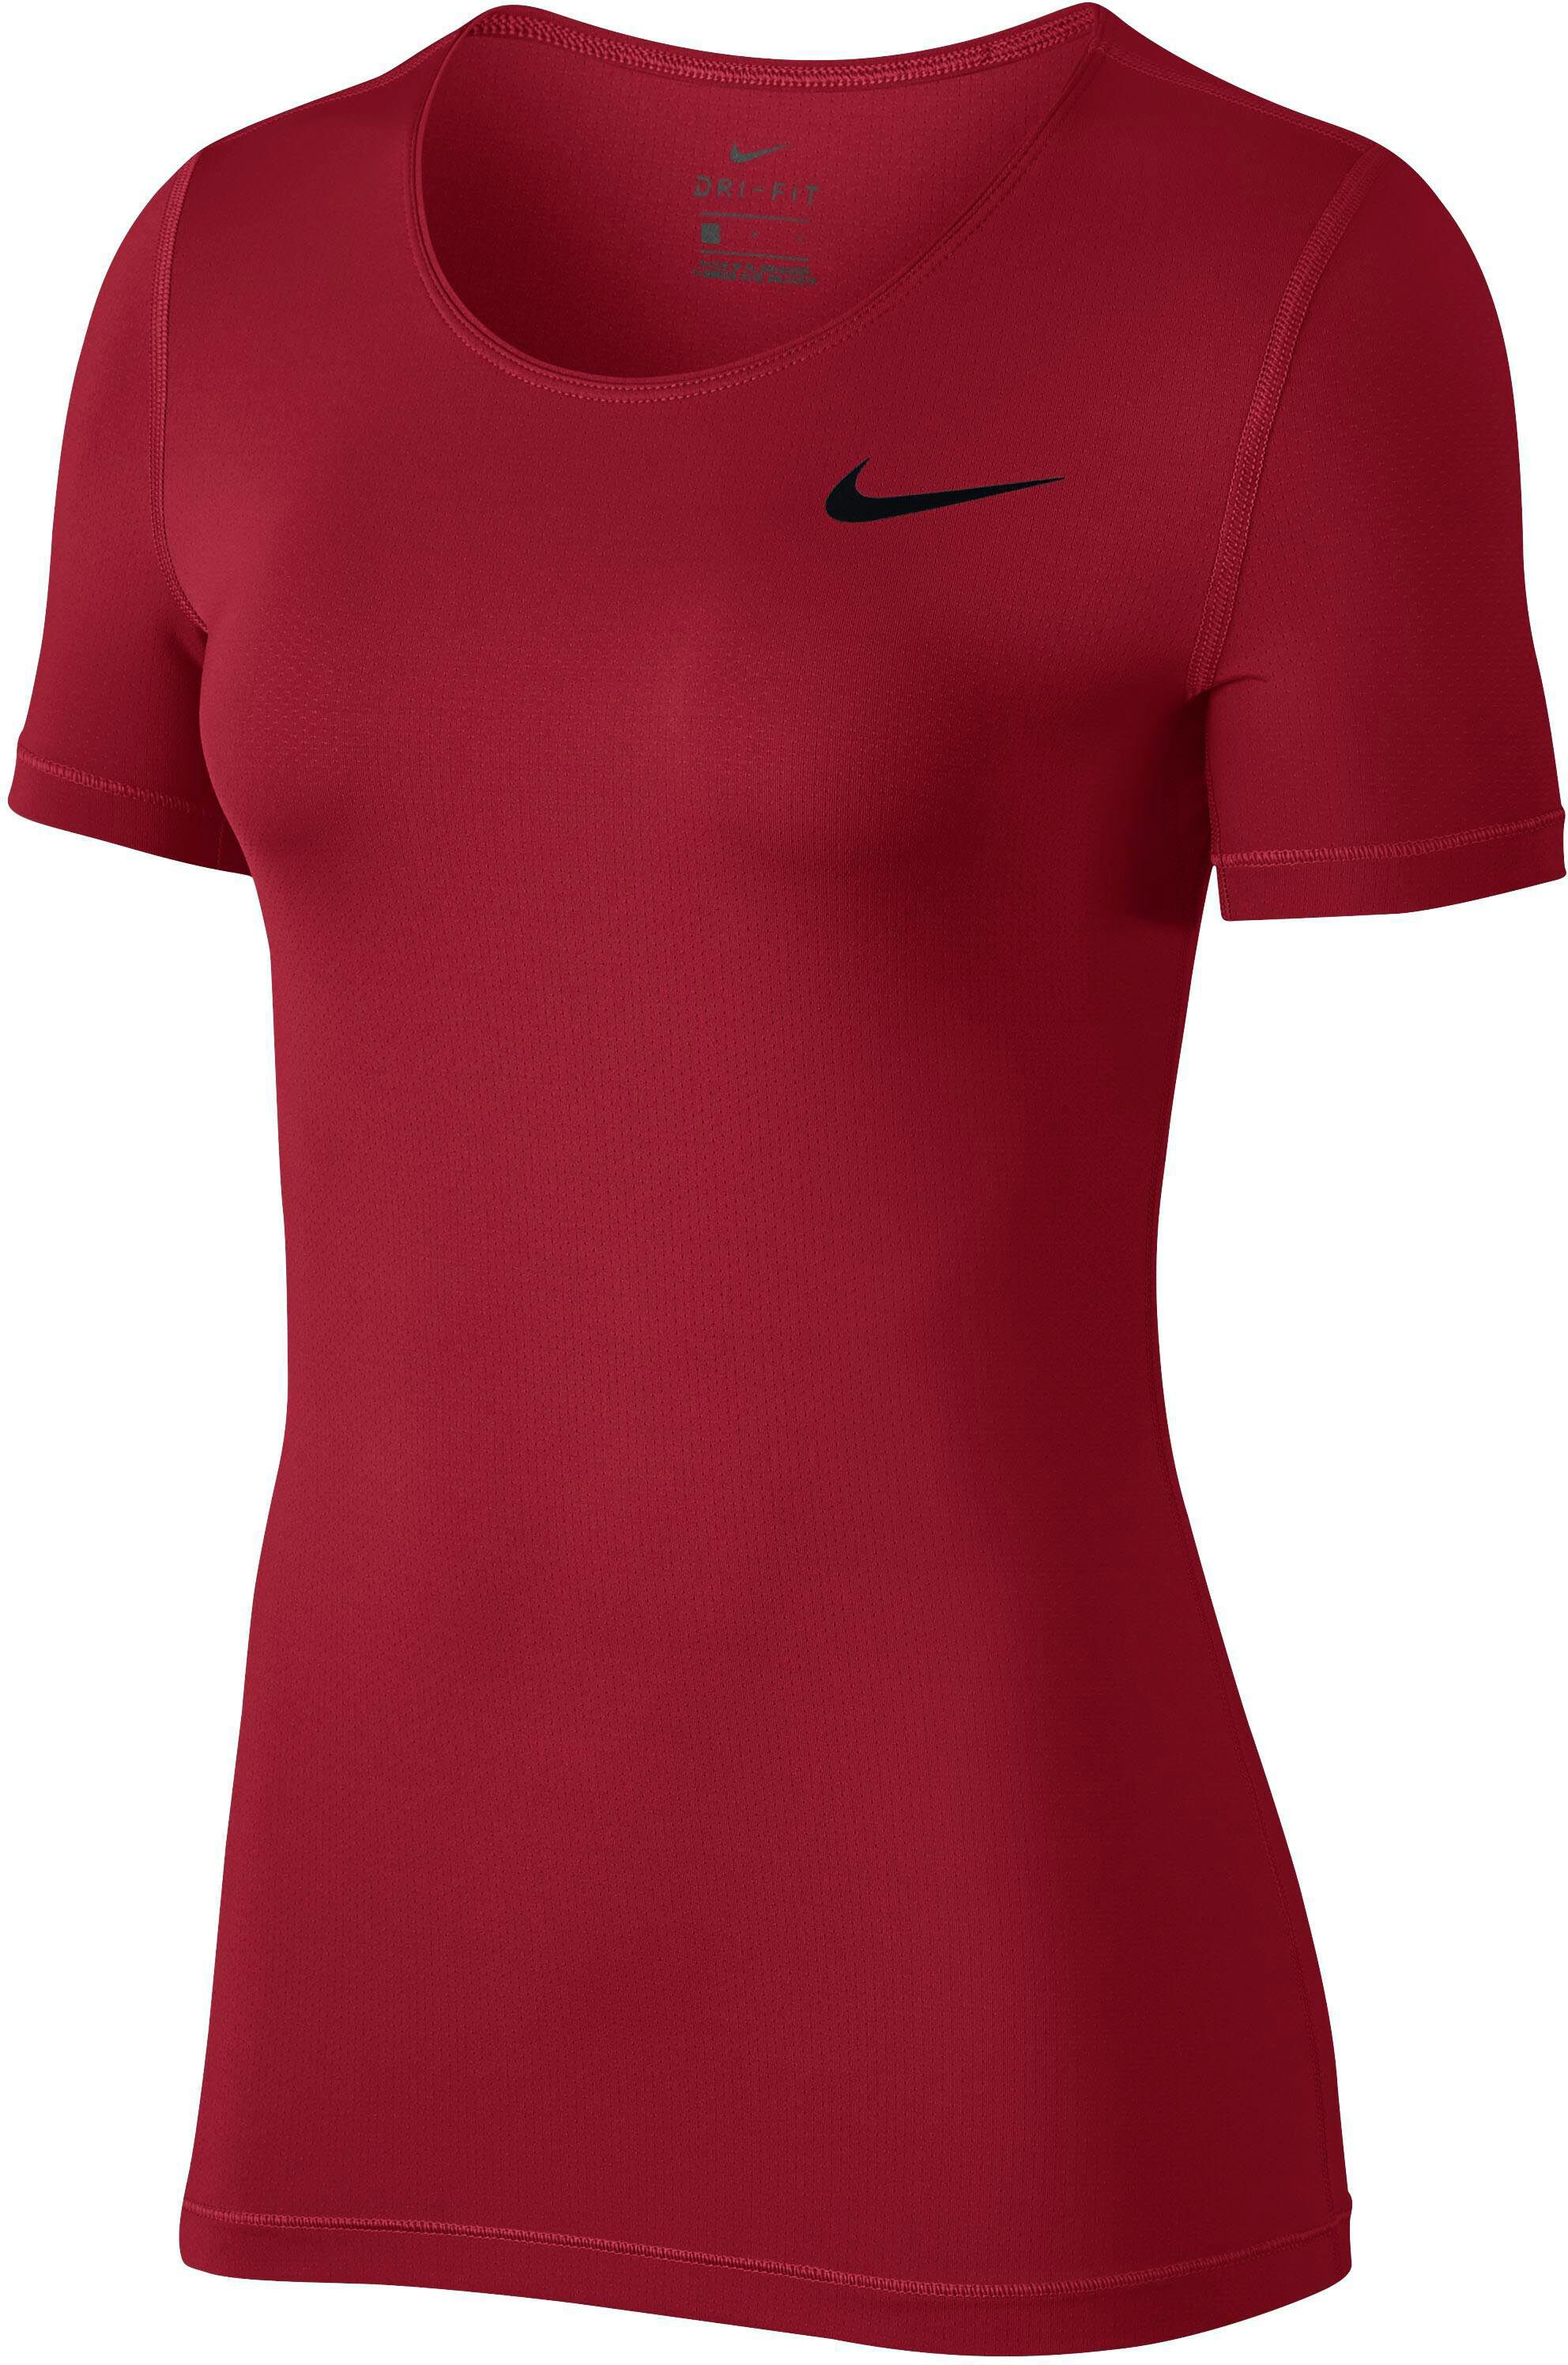 293d4a0bdf7ce Selección Ropa Intersport Nike Barata Deportiva XUfgHH6